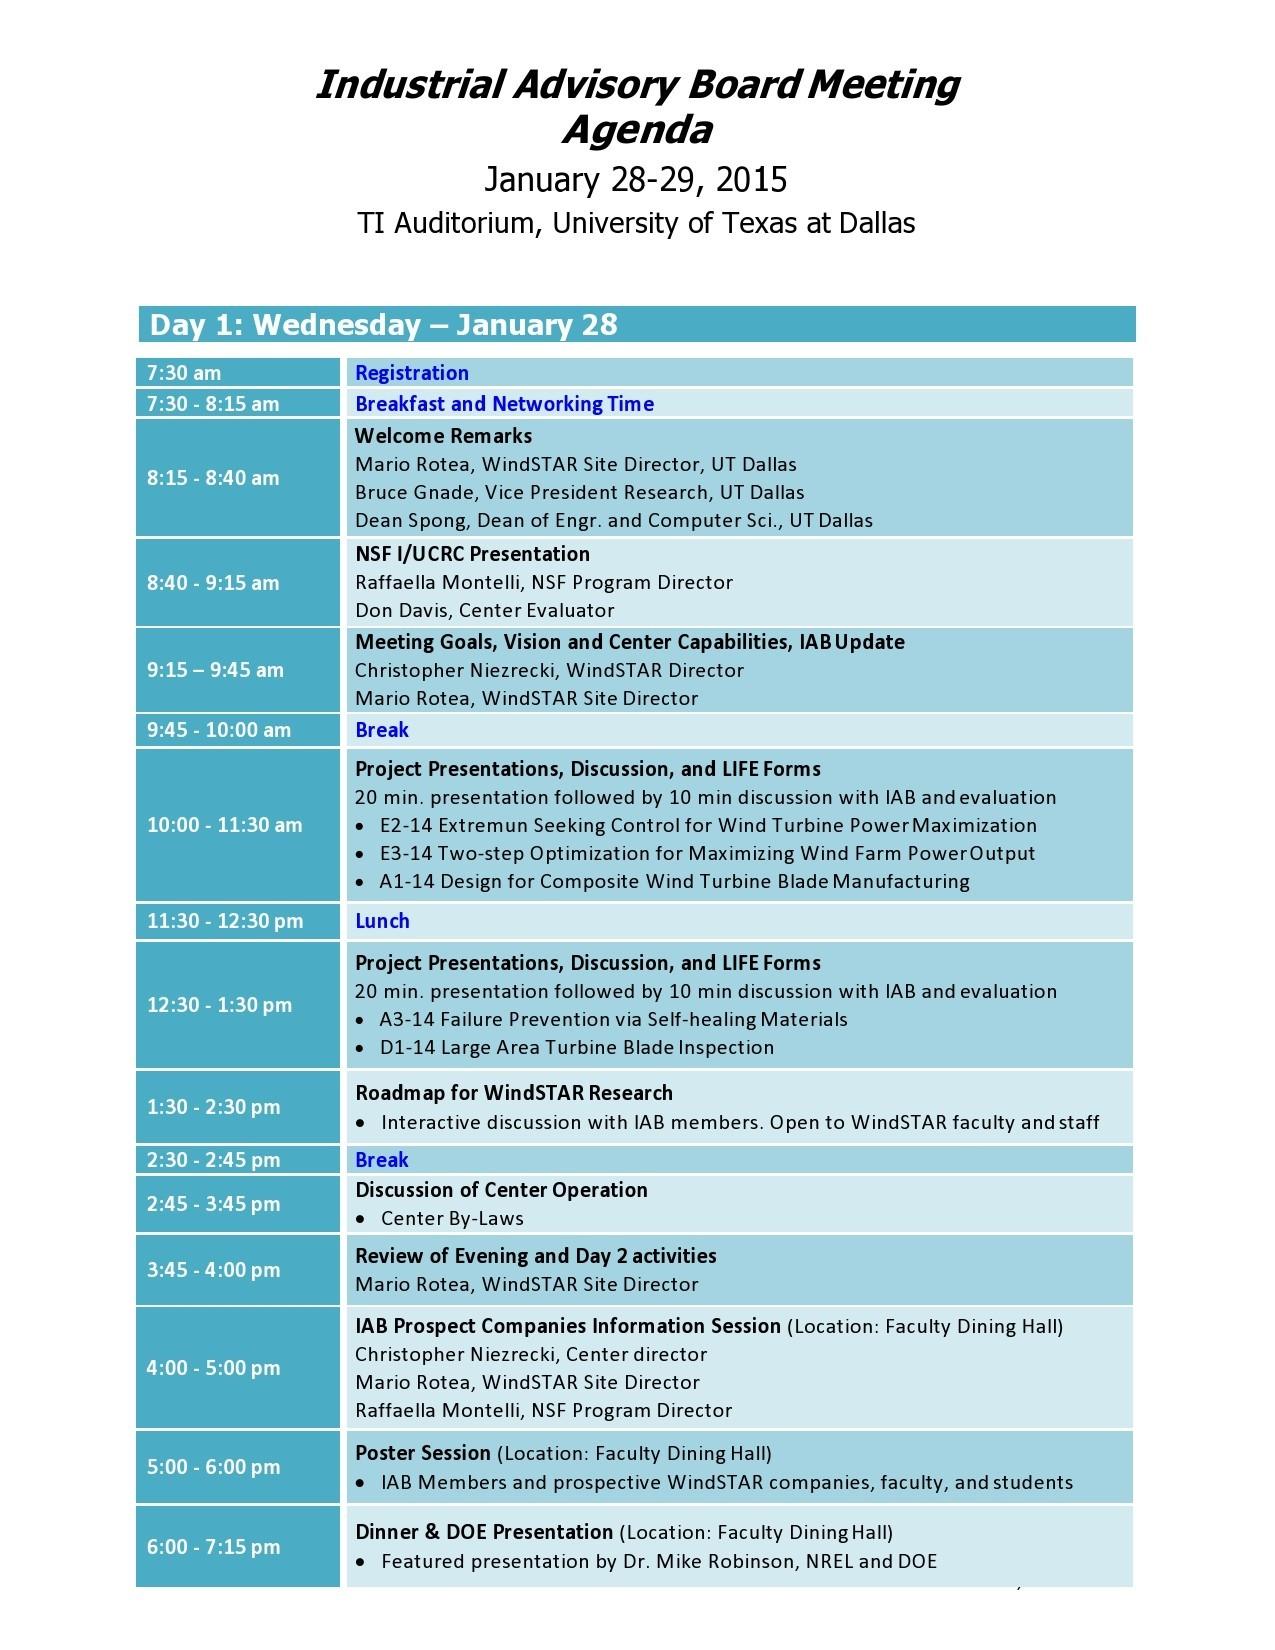 Free board meeting agenda 05